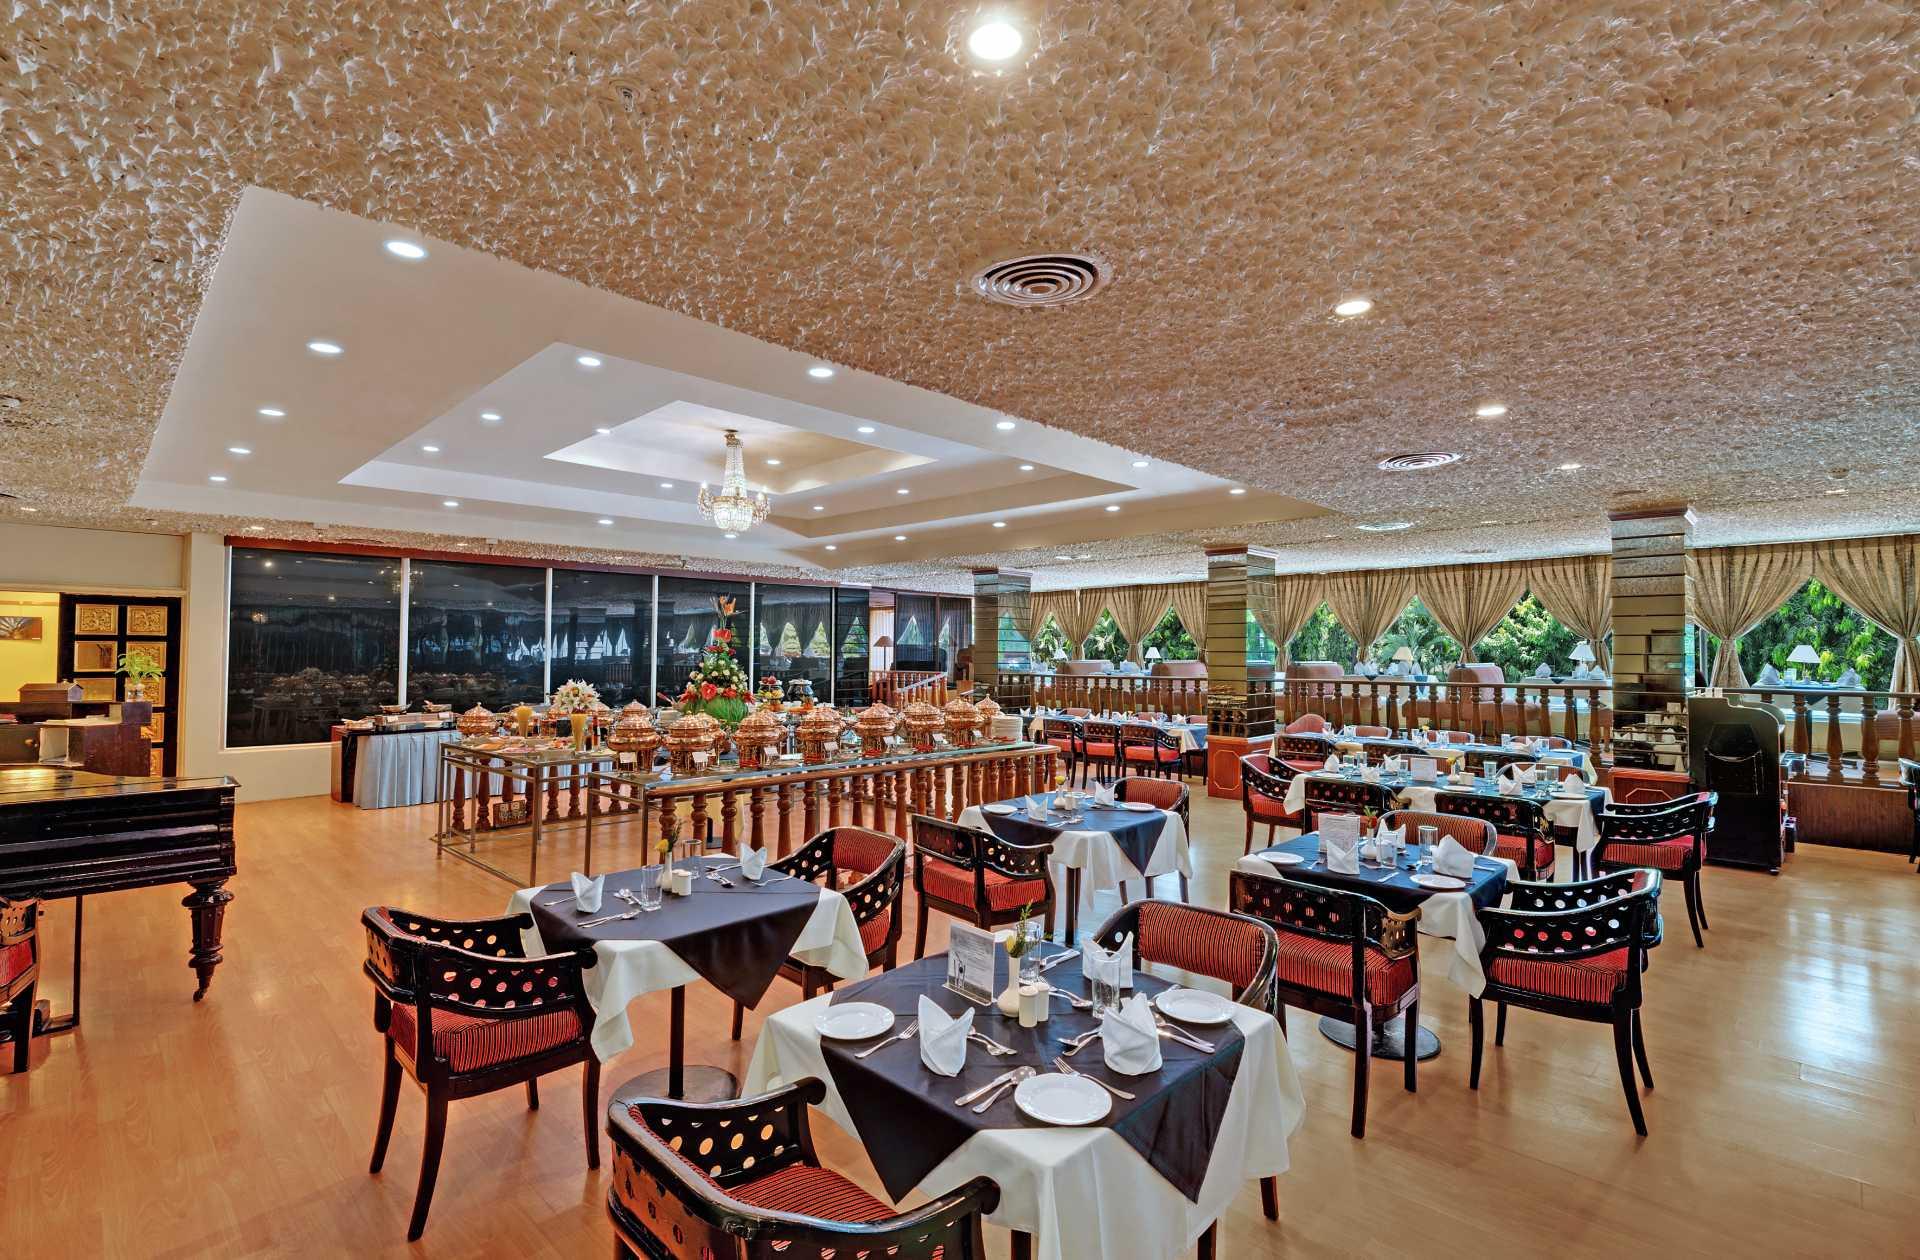 The Society Restaurant ambassador pallava chennai - The Ambassador | Heritage Hotels in Mumbai, Aurangabad, Chennai - Ambassador Pallava Chennai